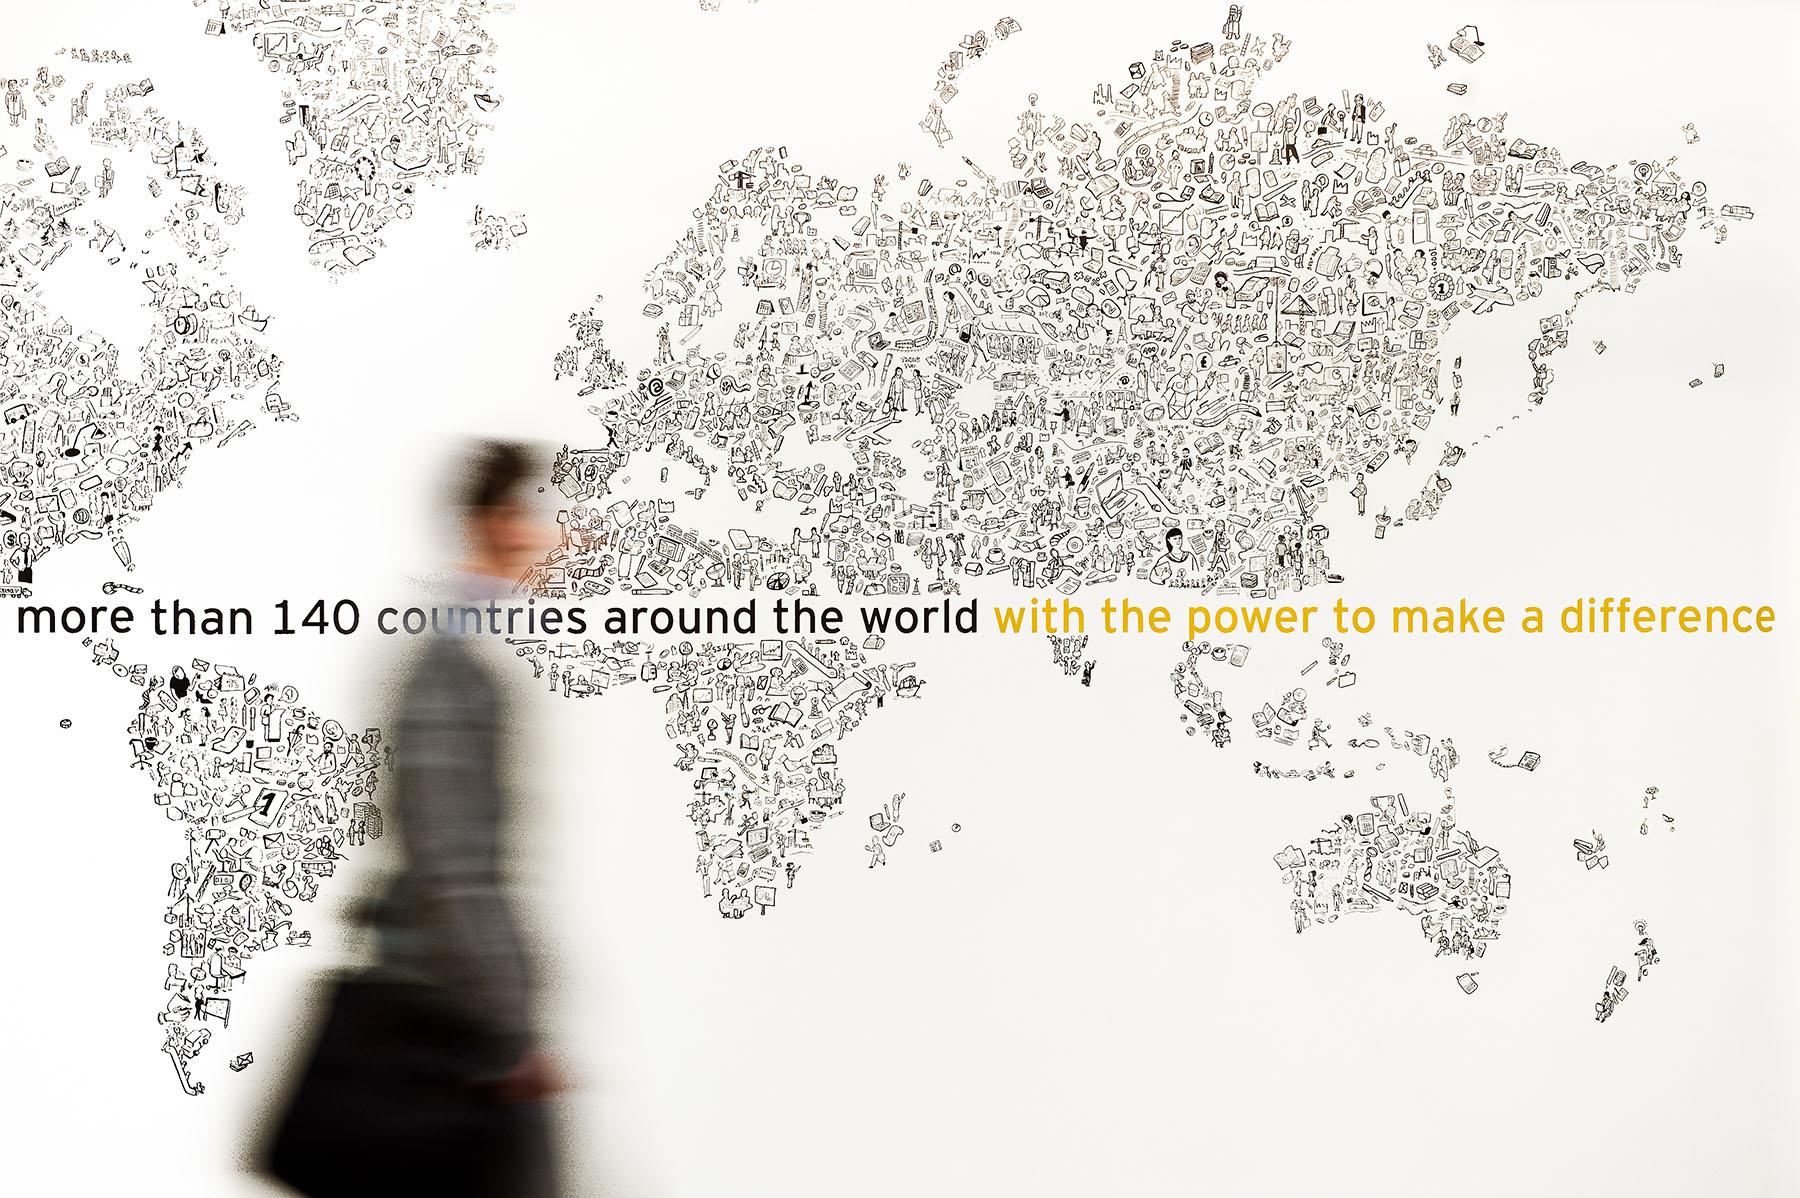 more than 140 countries_web.jpg